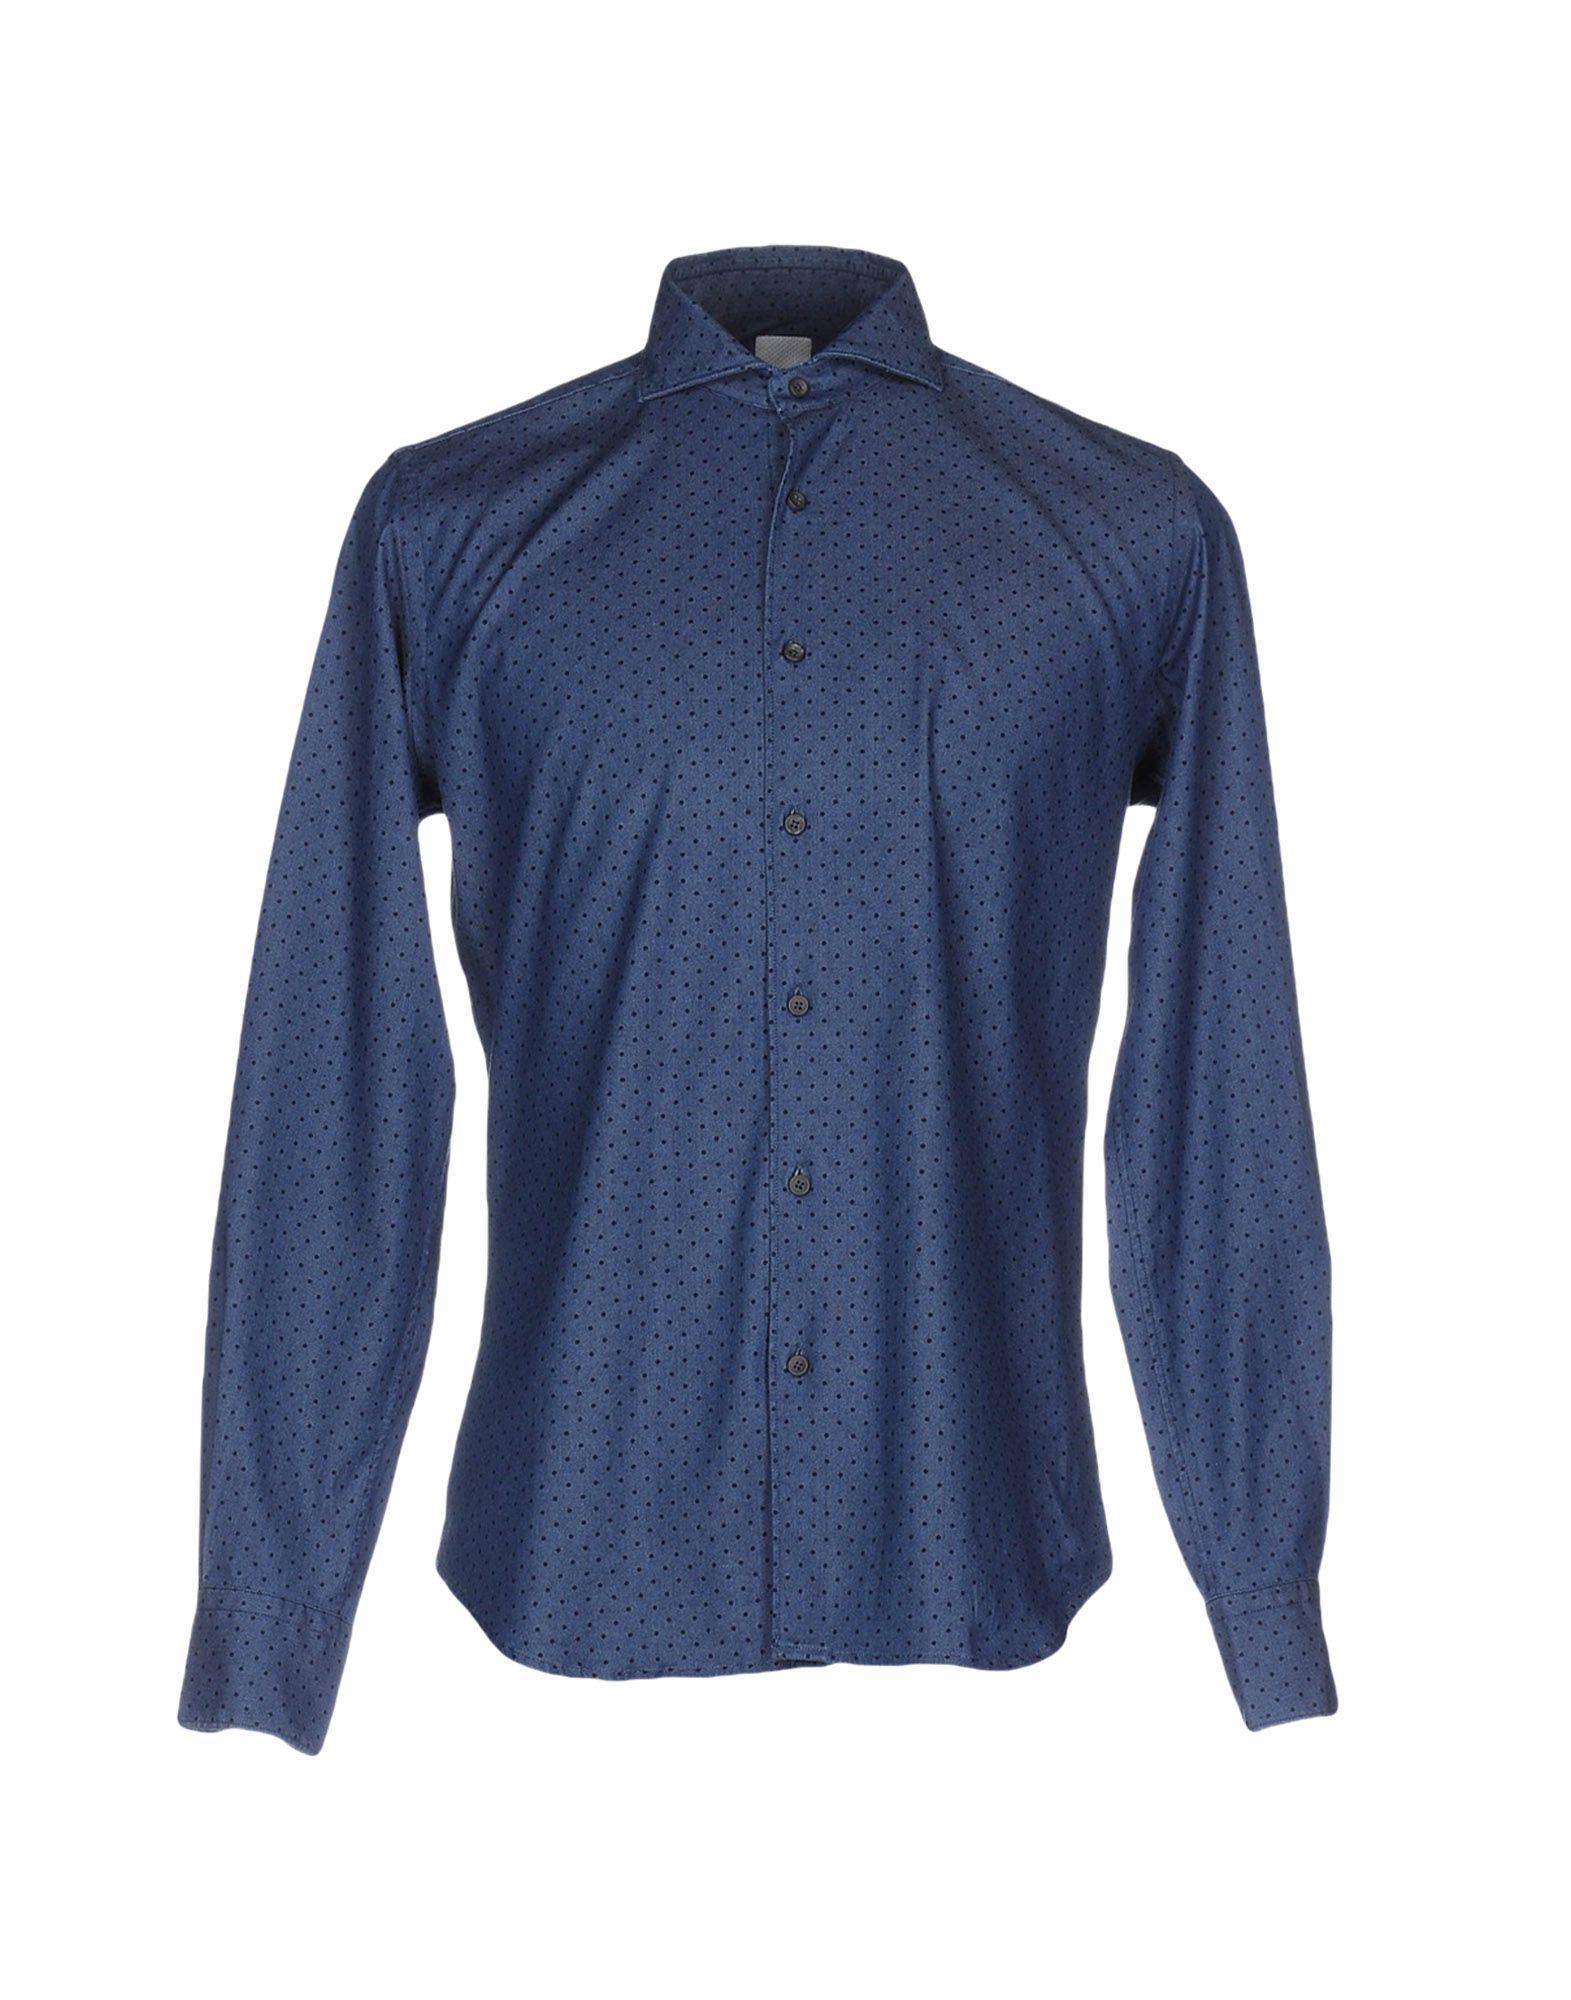 цена CELLINI Джинсовая рубашка онлайн в 2017 году